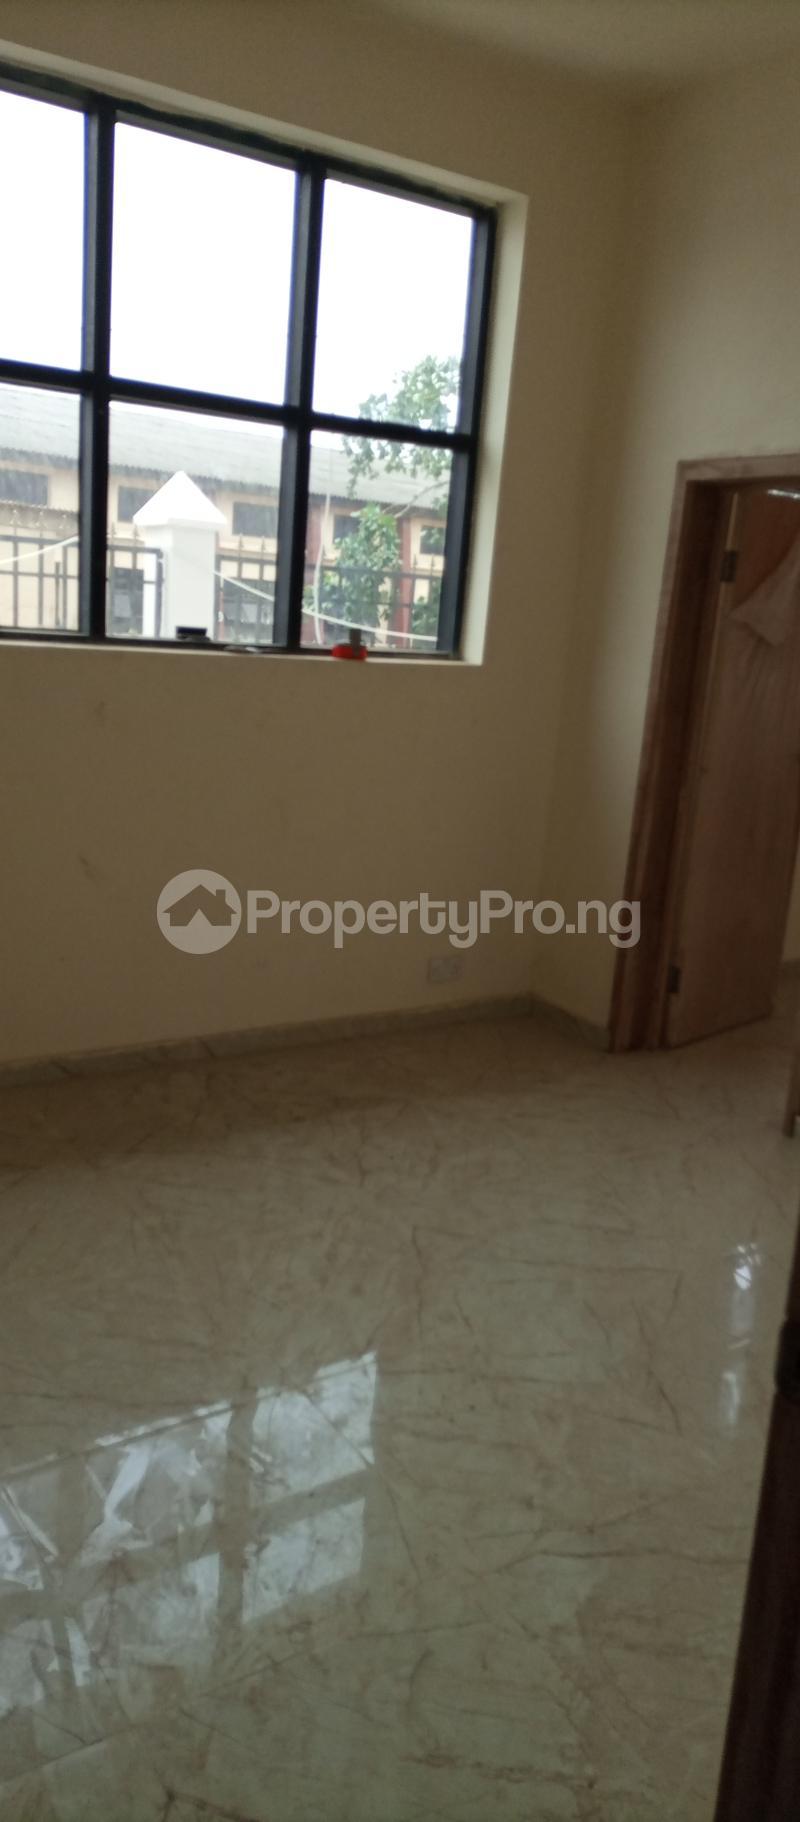 3 bedroom Office Space Commercial Property for rent Abiolaway Abeokuta, Ogun State. Abeokuta Ogun - 3